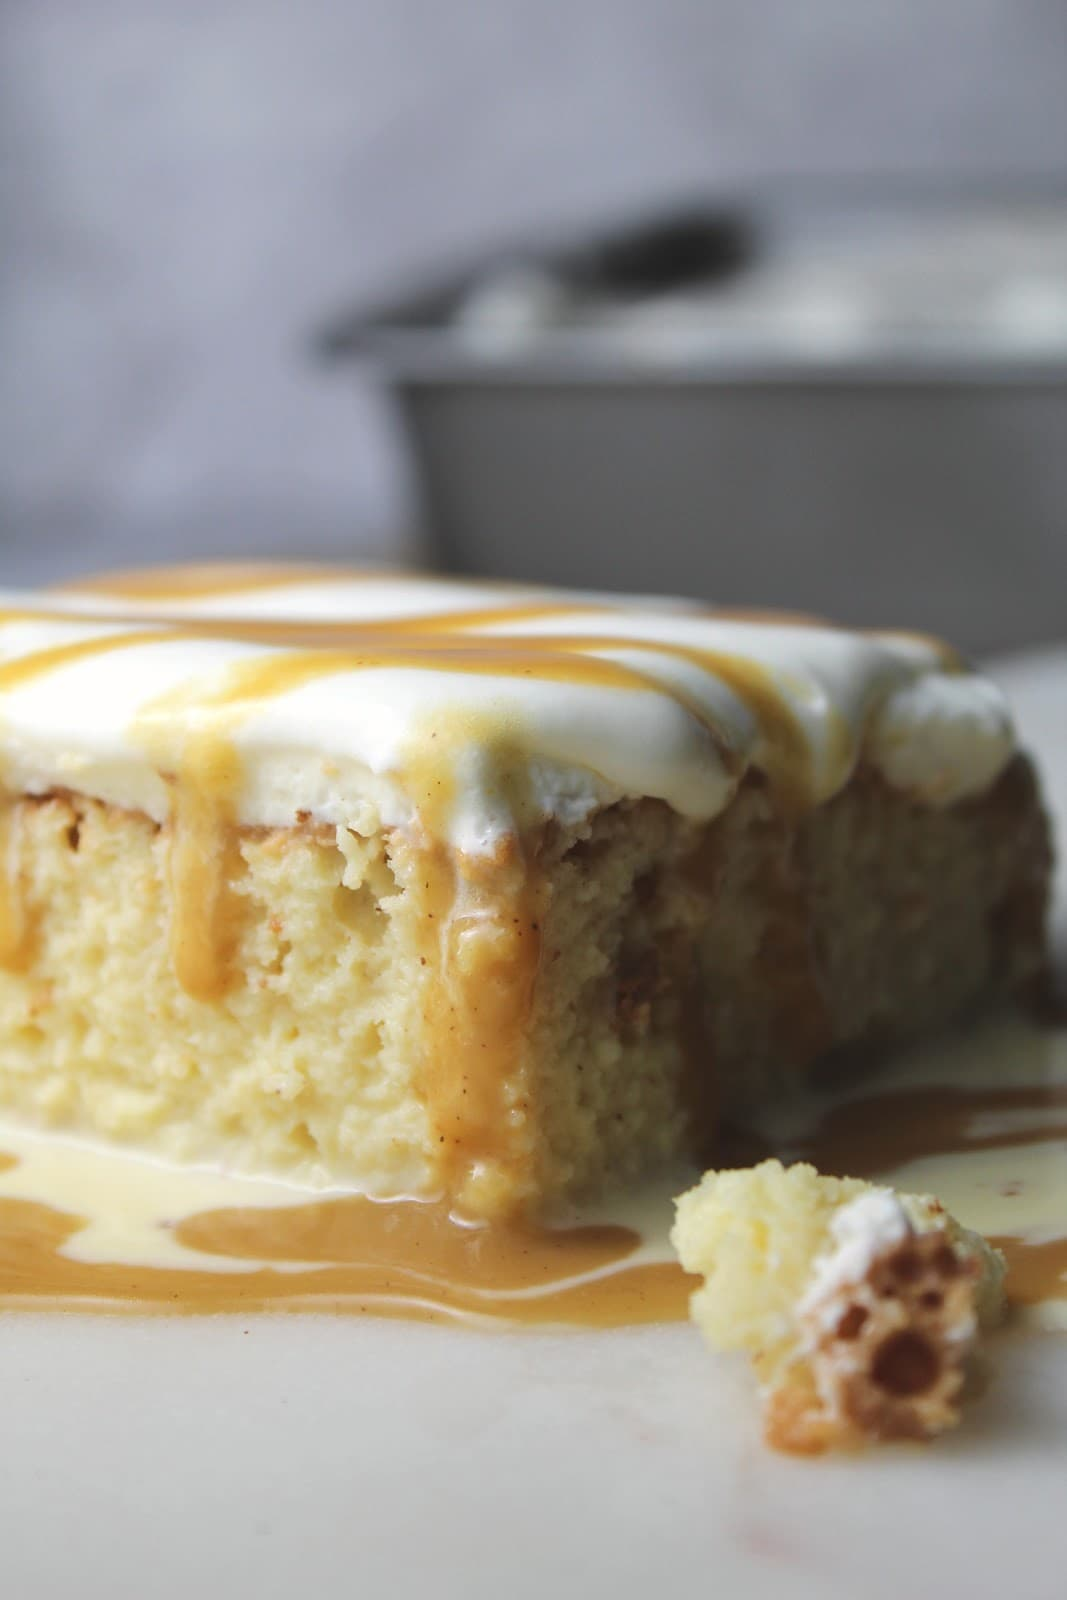 @biculturalfamilia's cover photo for 'Eggnog Tres Leches Cake with Eggnog Butterscotch Sauce'